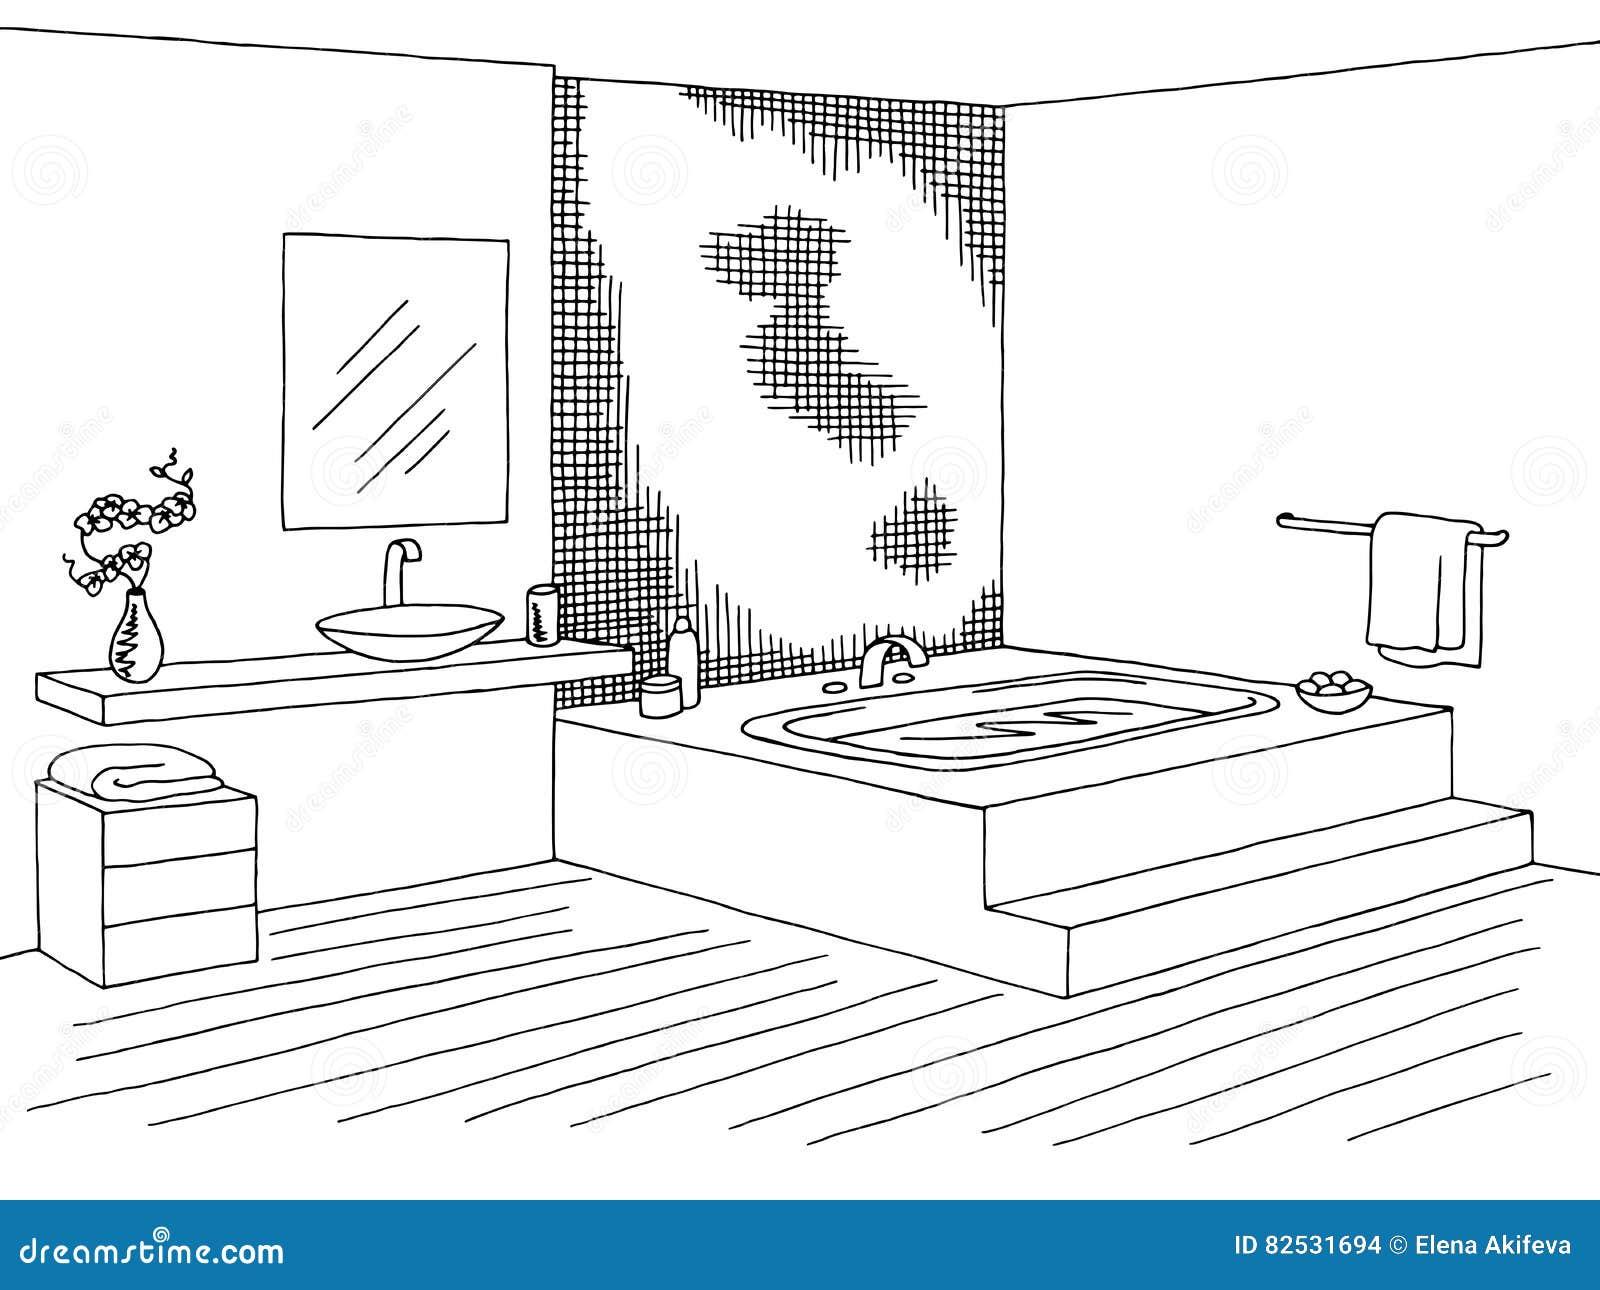 Bathroom Graphic Interior Black White Sketch Illustration